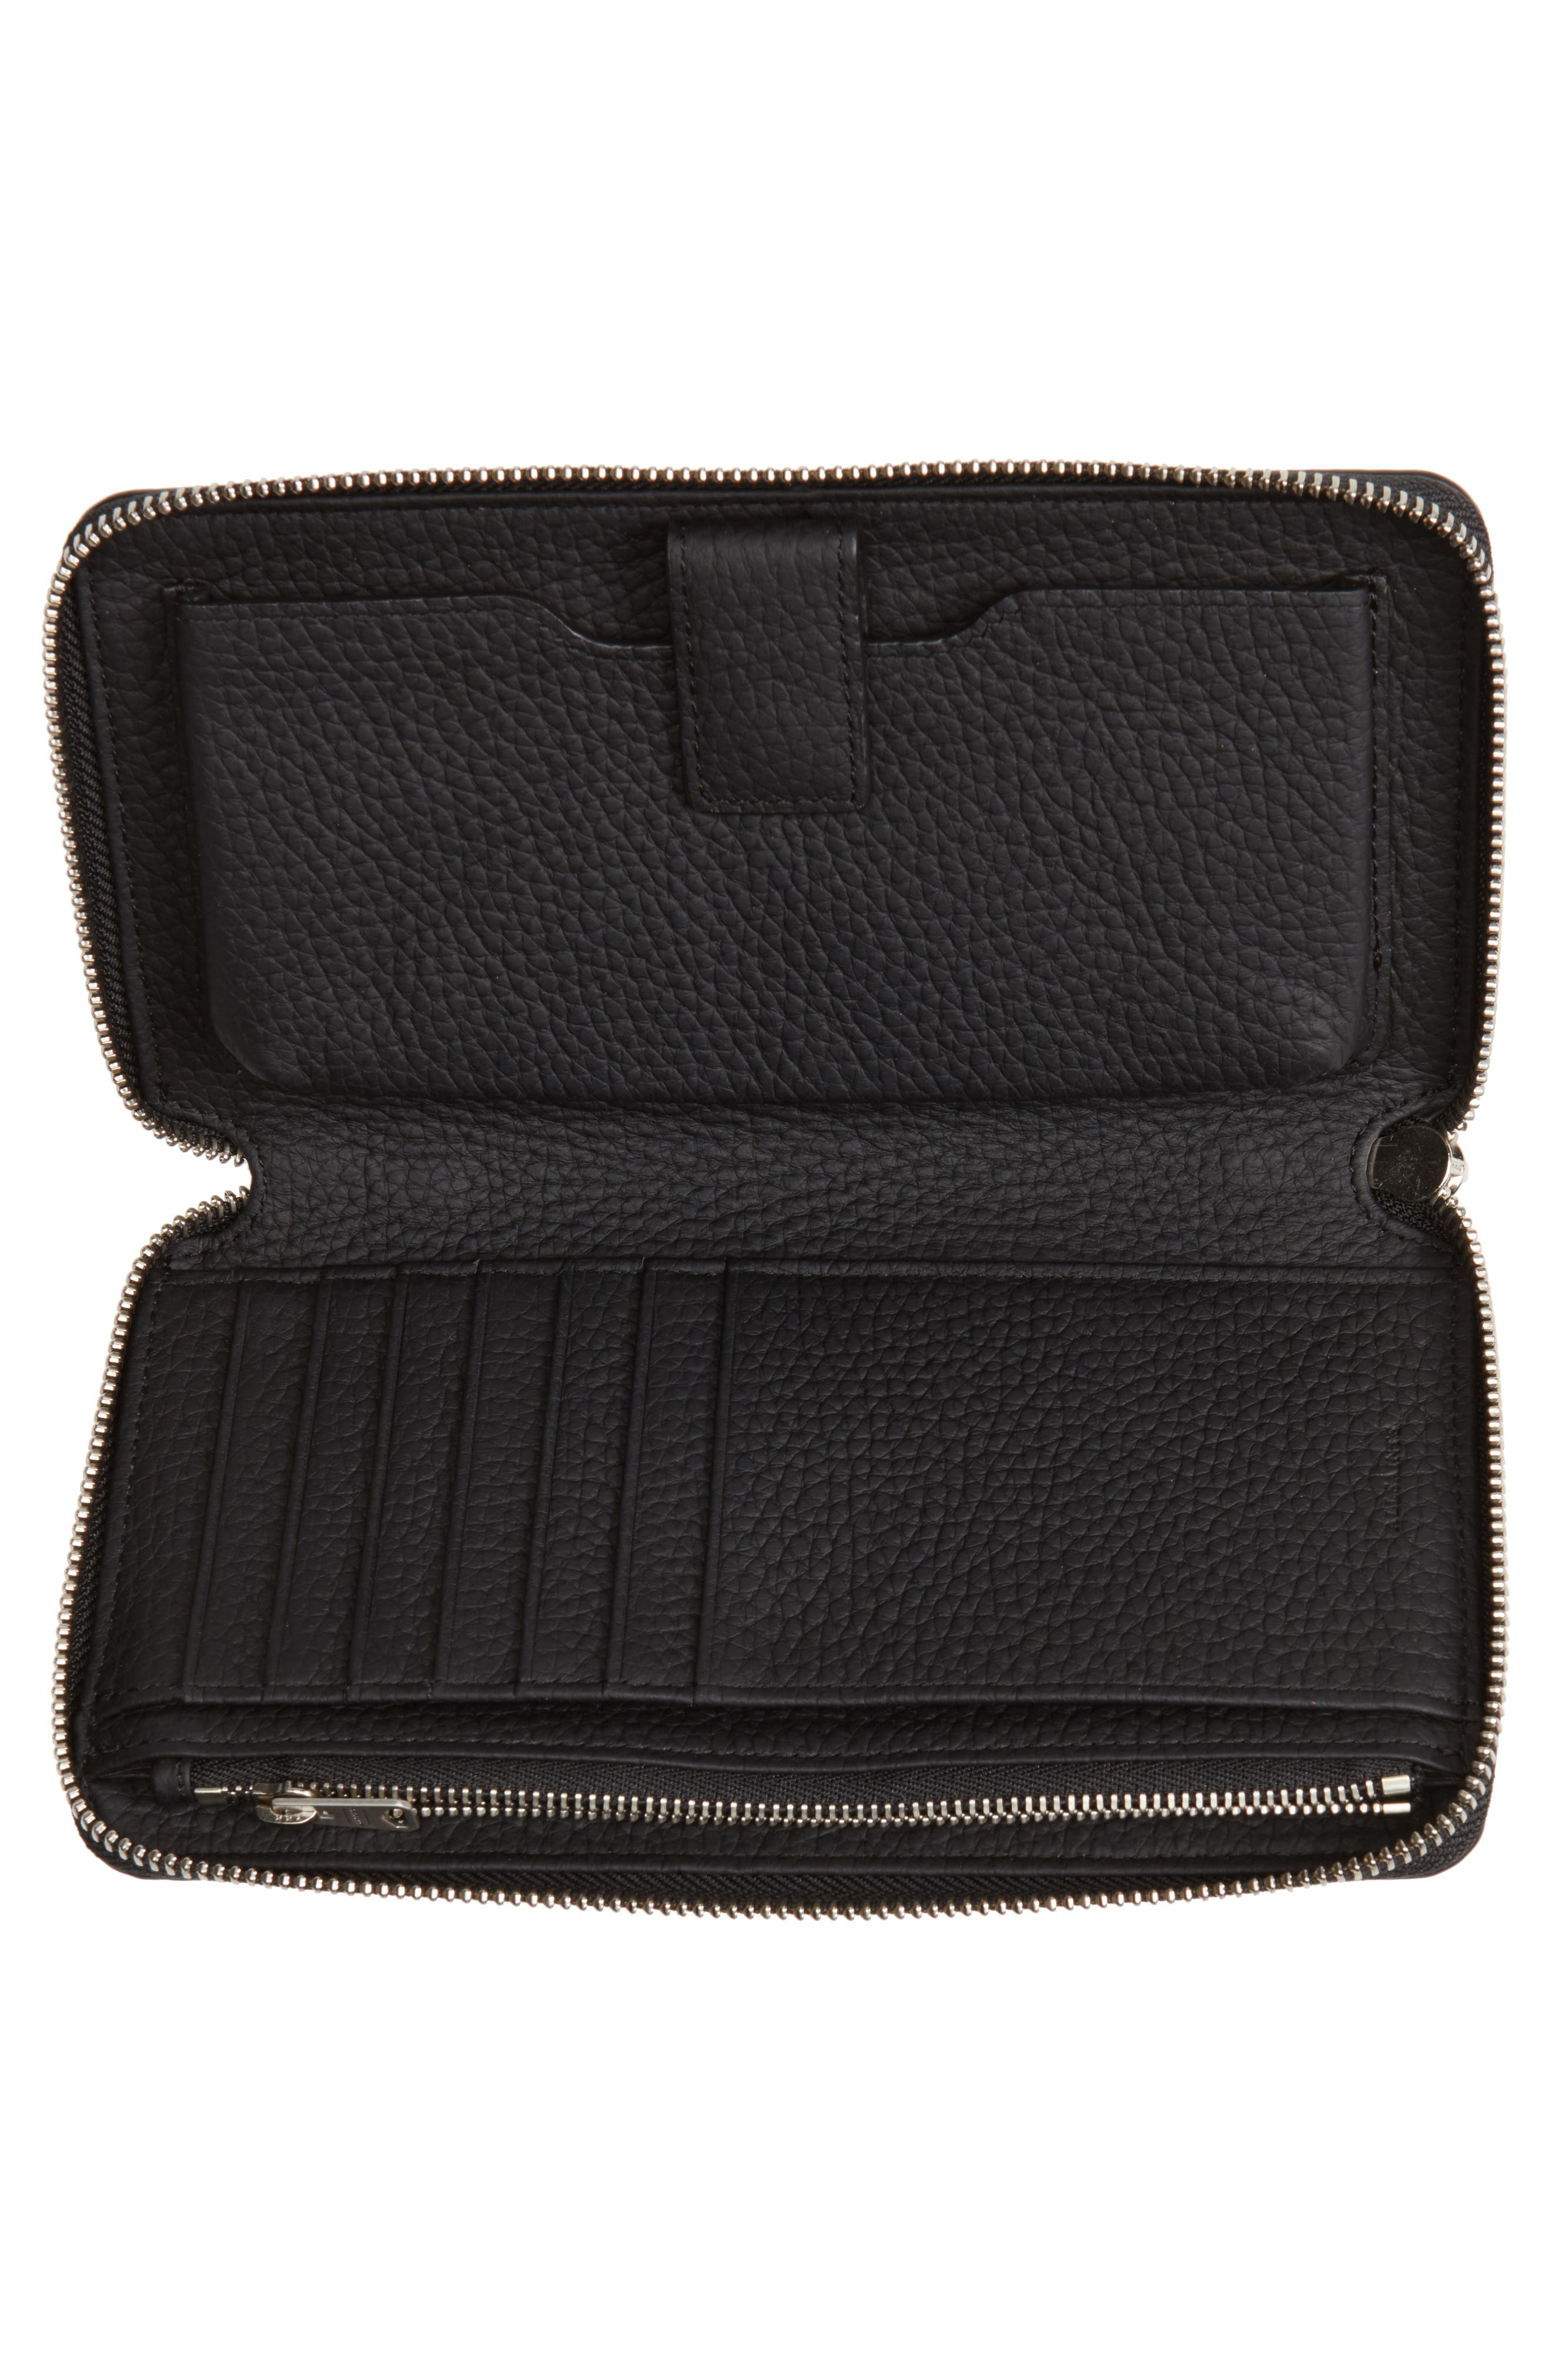 Fetch Leather Phone Wristlet,                             Alternate thumbnail 4, color,                             Black